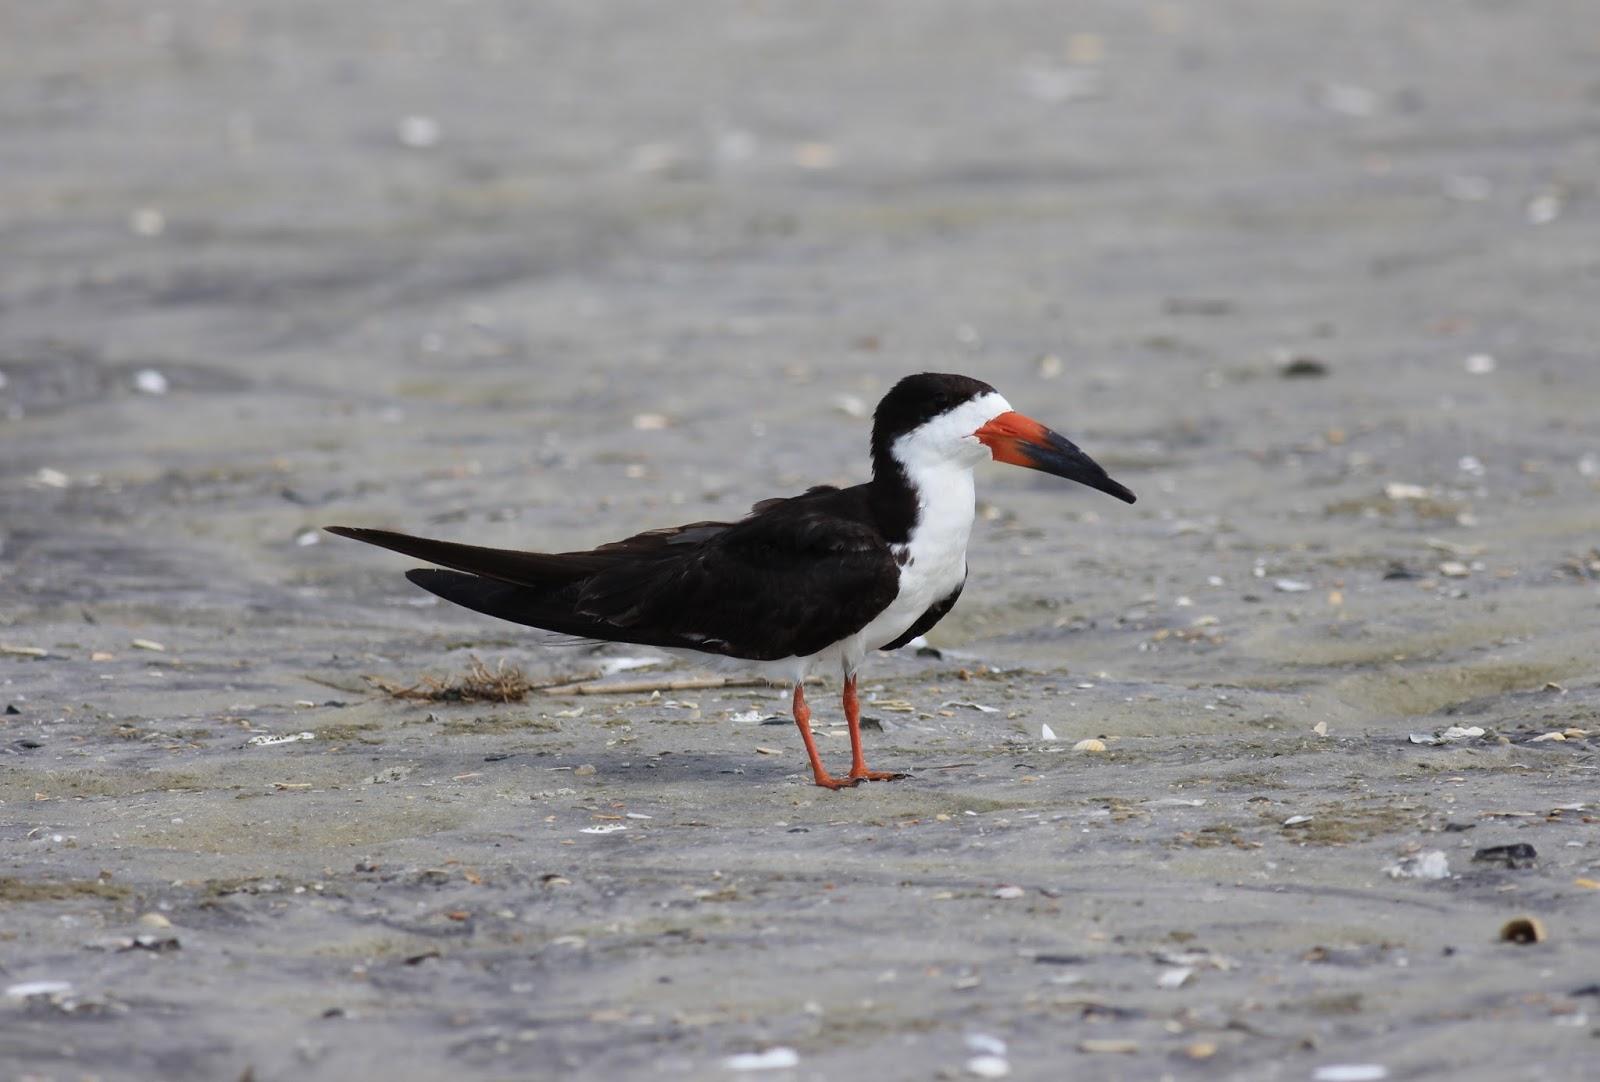 North Carolina Photographic Big Year 2016: Birding is Hard